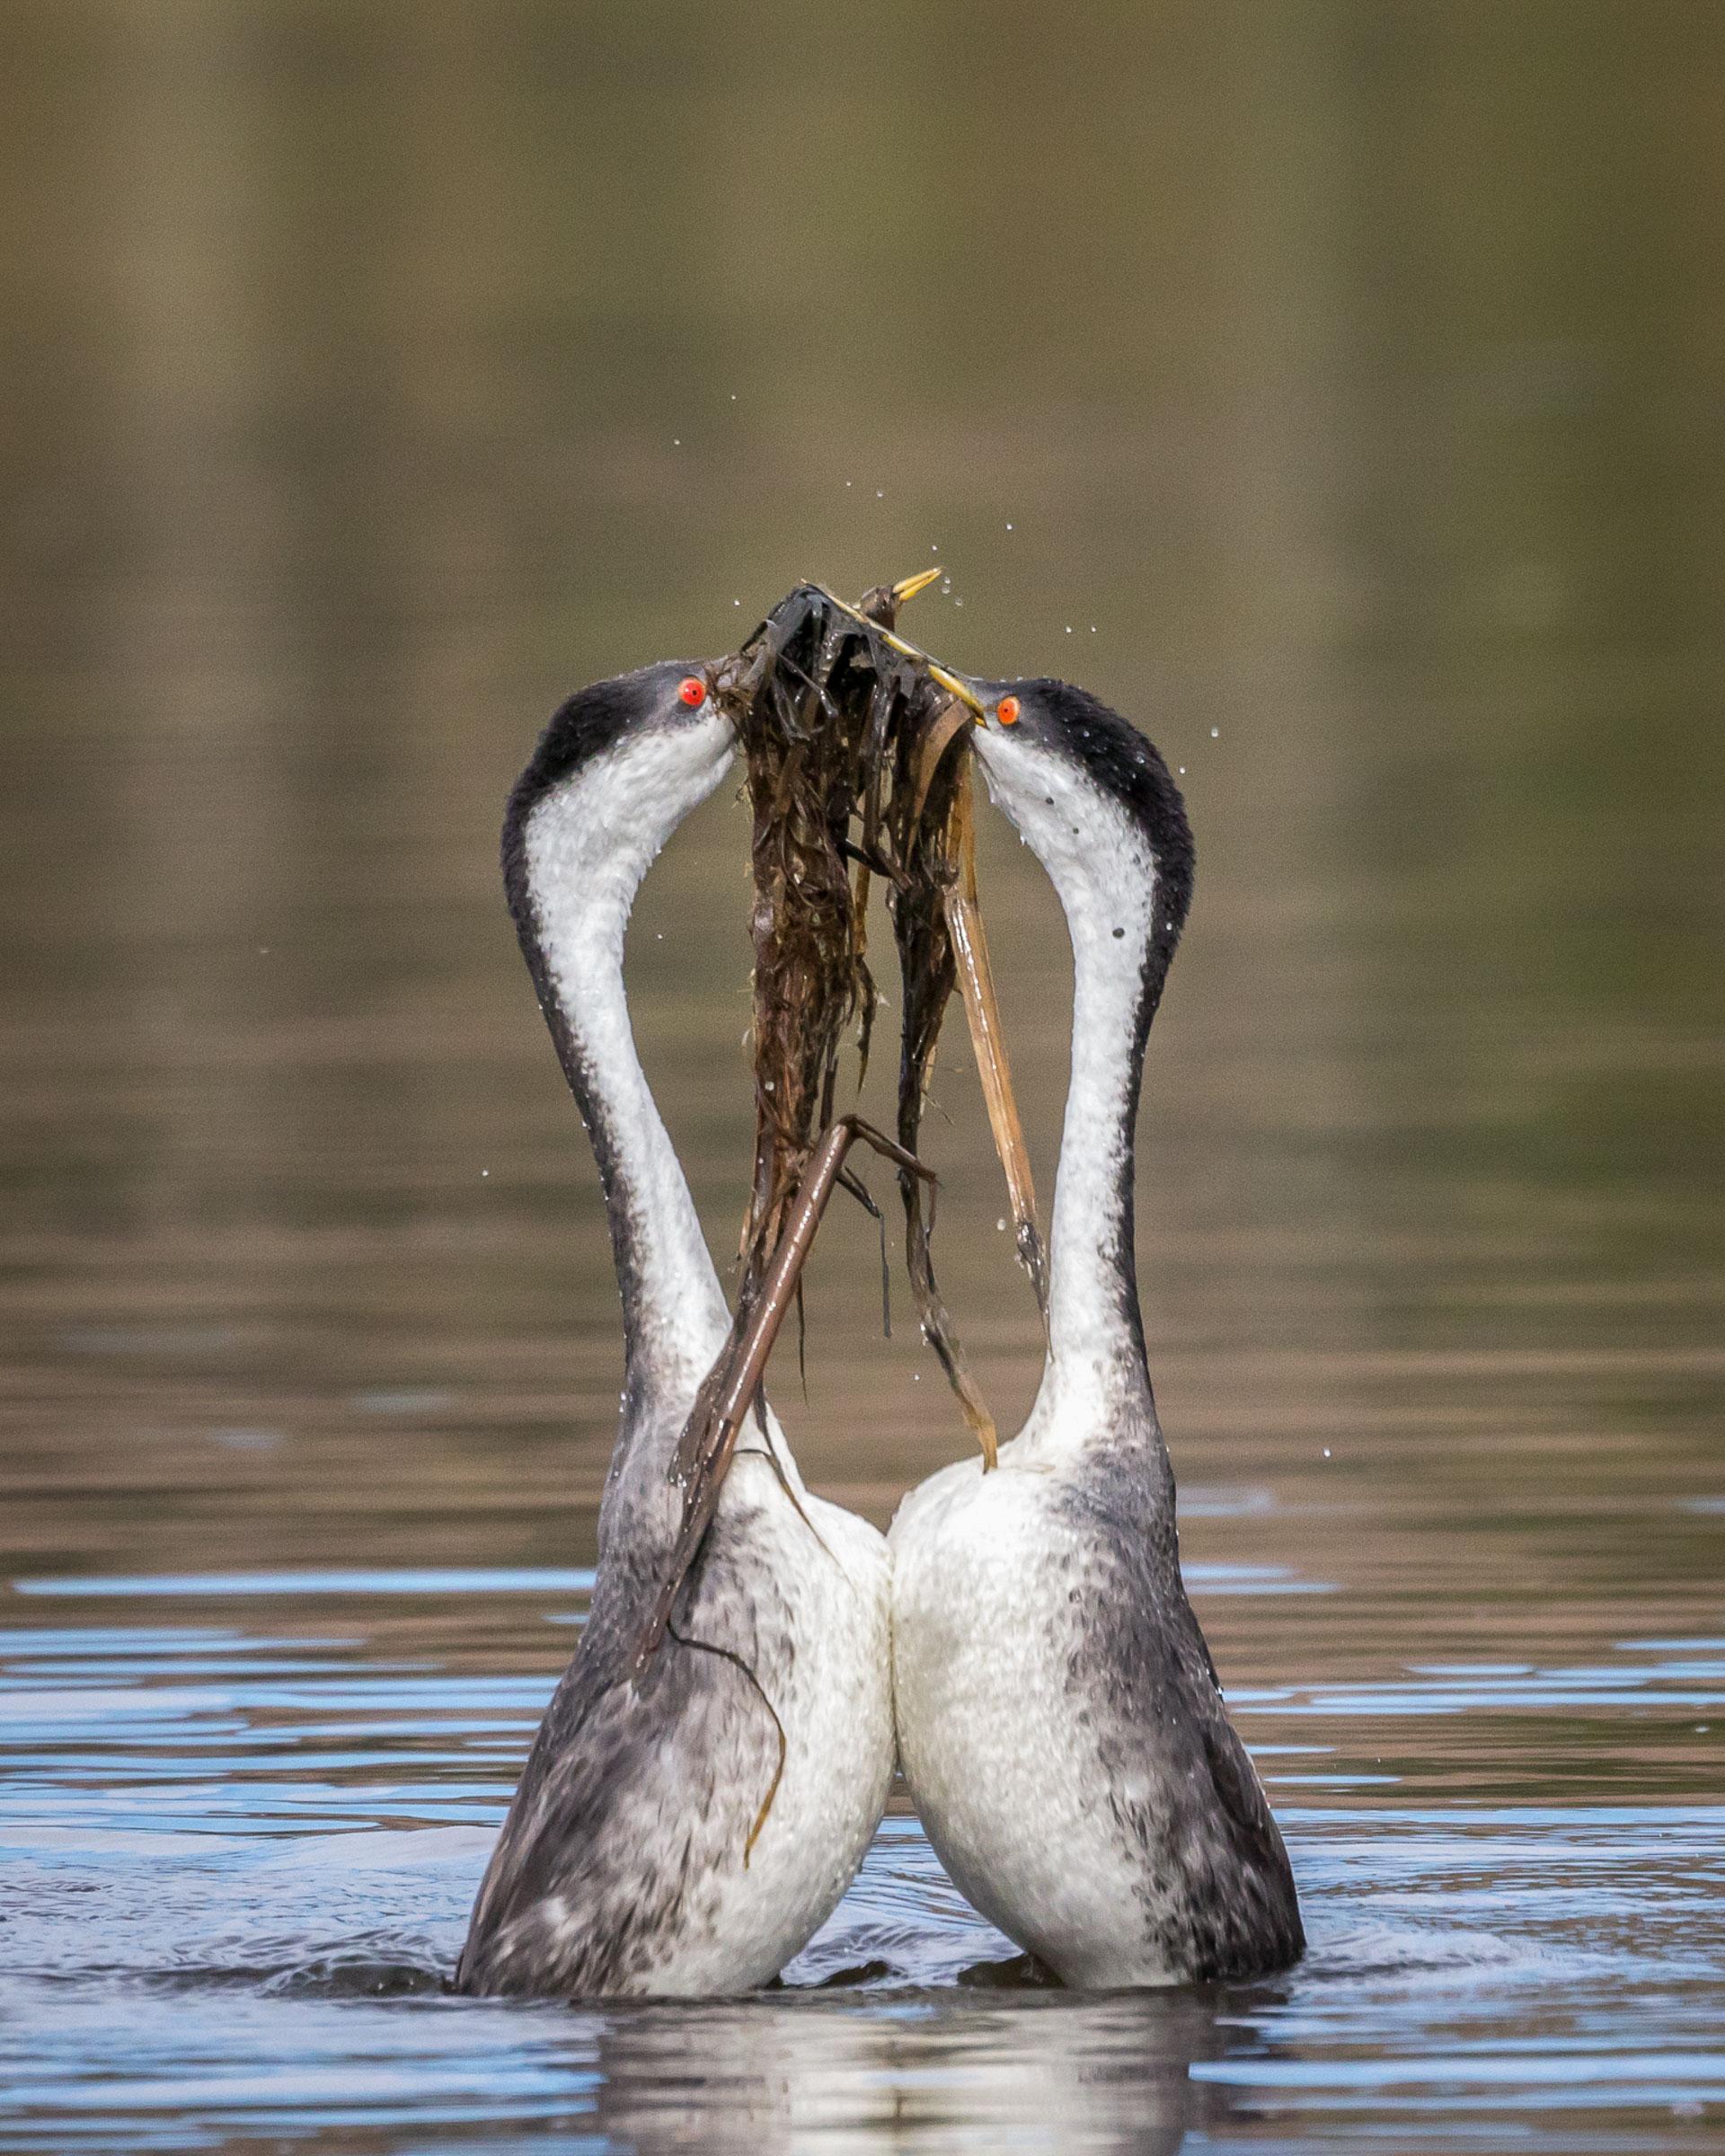 Western Grebes. Krisztina Scheeff/Audubon Photography Awards